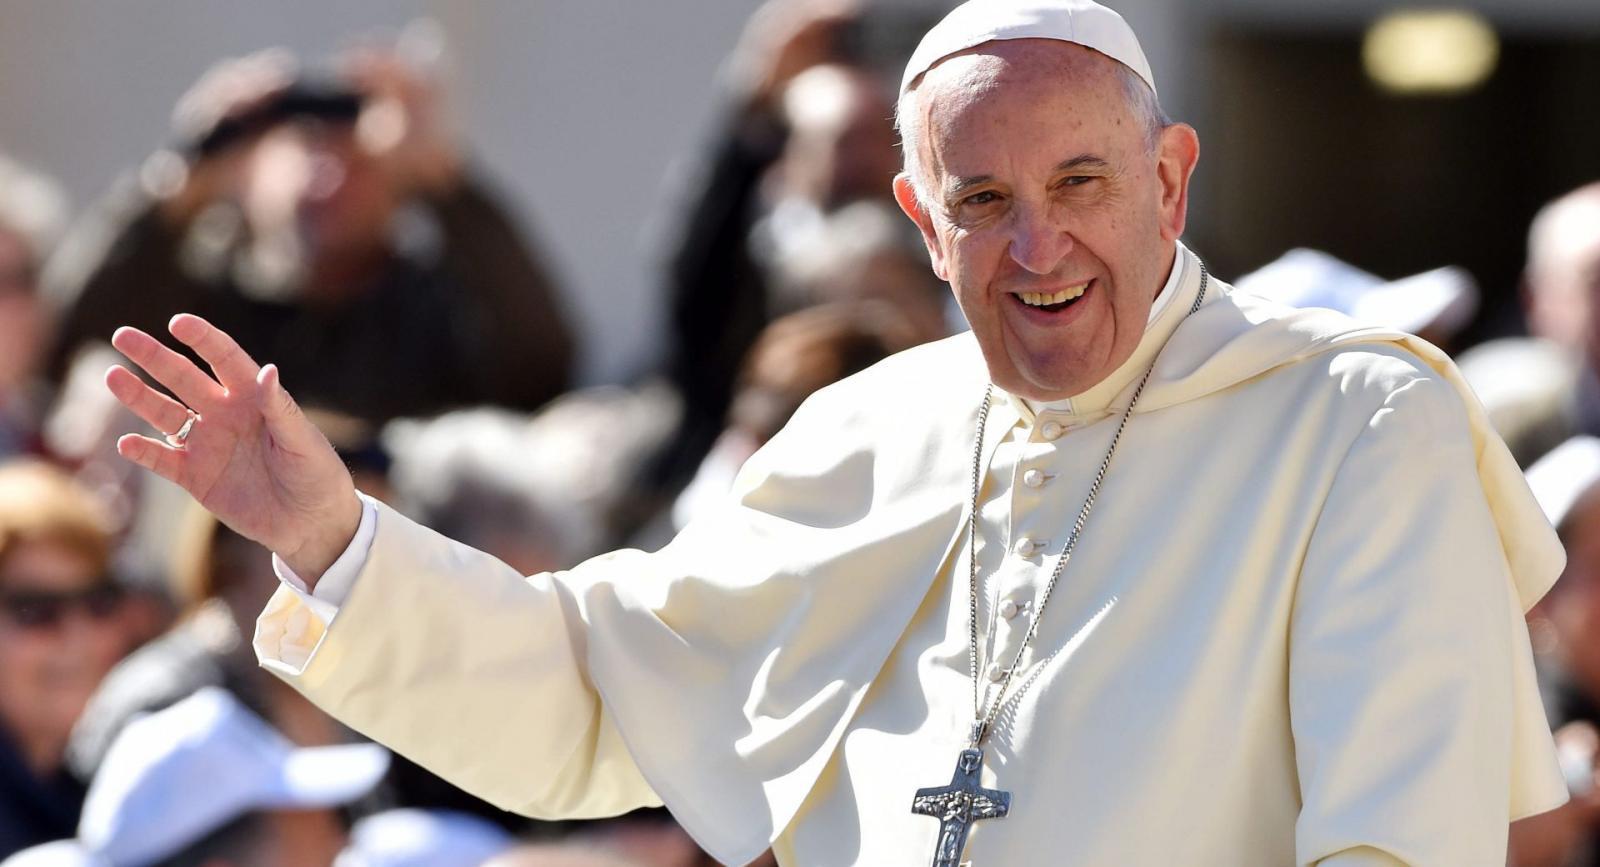 Король Ватикана Папа Франциск